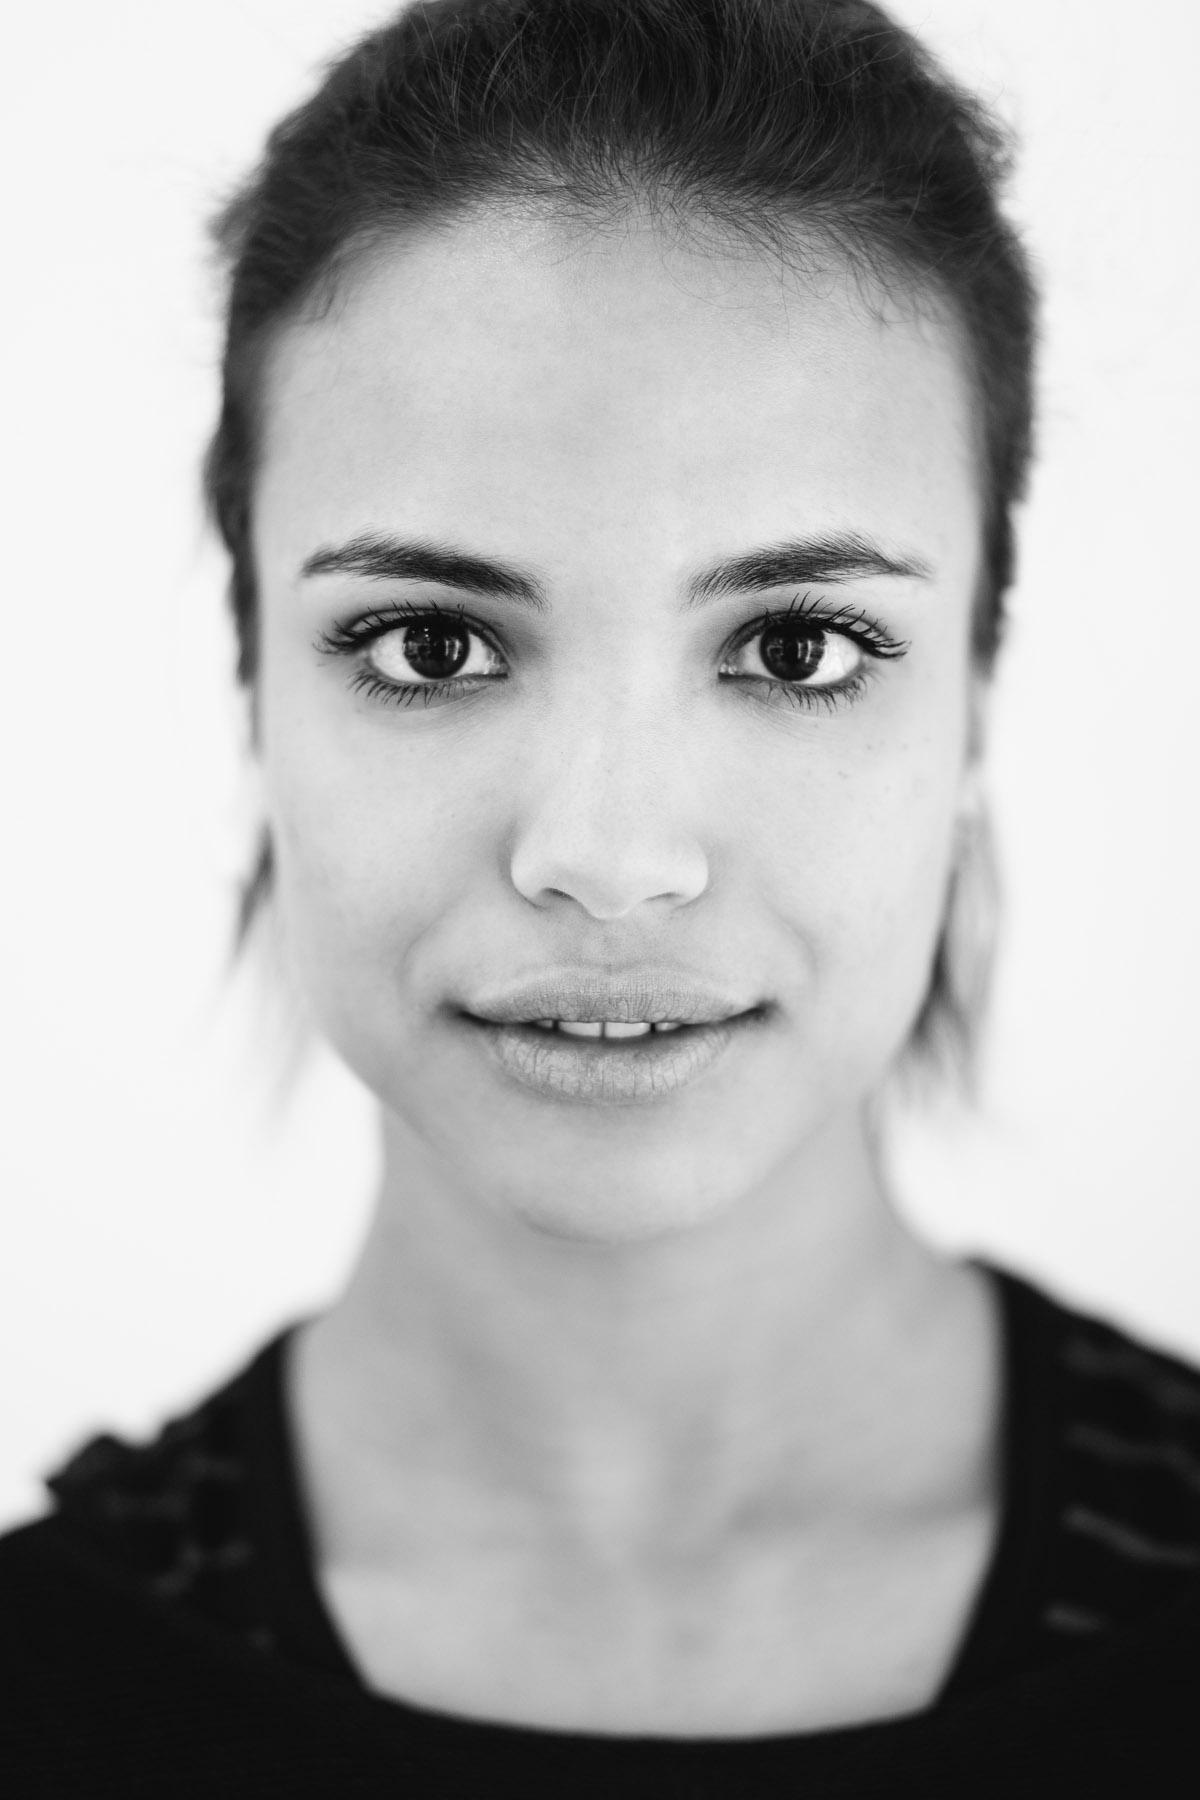 closeup-portrait-calgary-blackandwhite.jpgcloseup-portrait-calgary-blackandwhite.jpeg